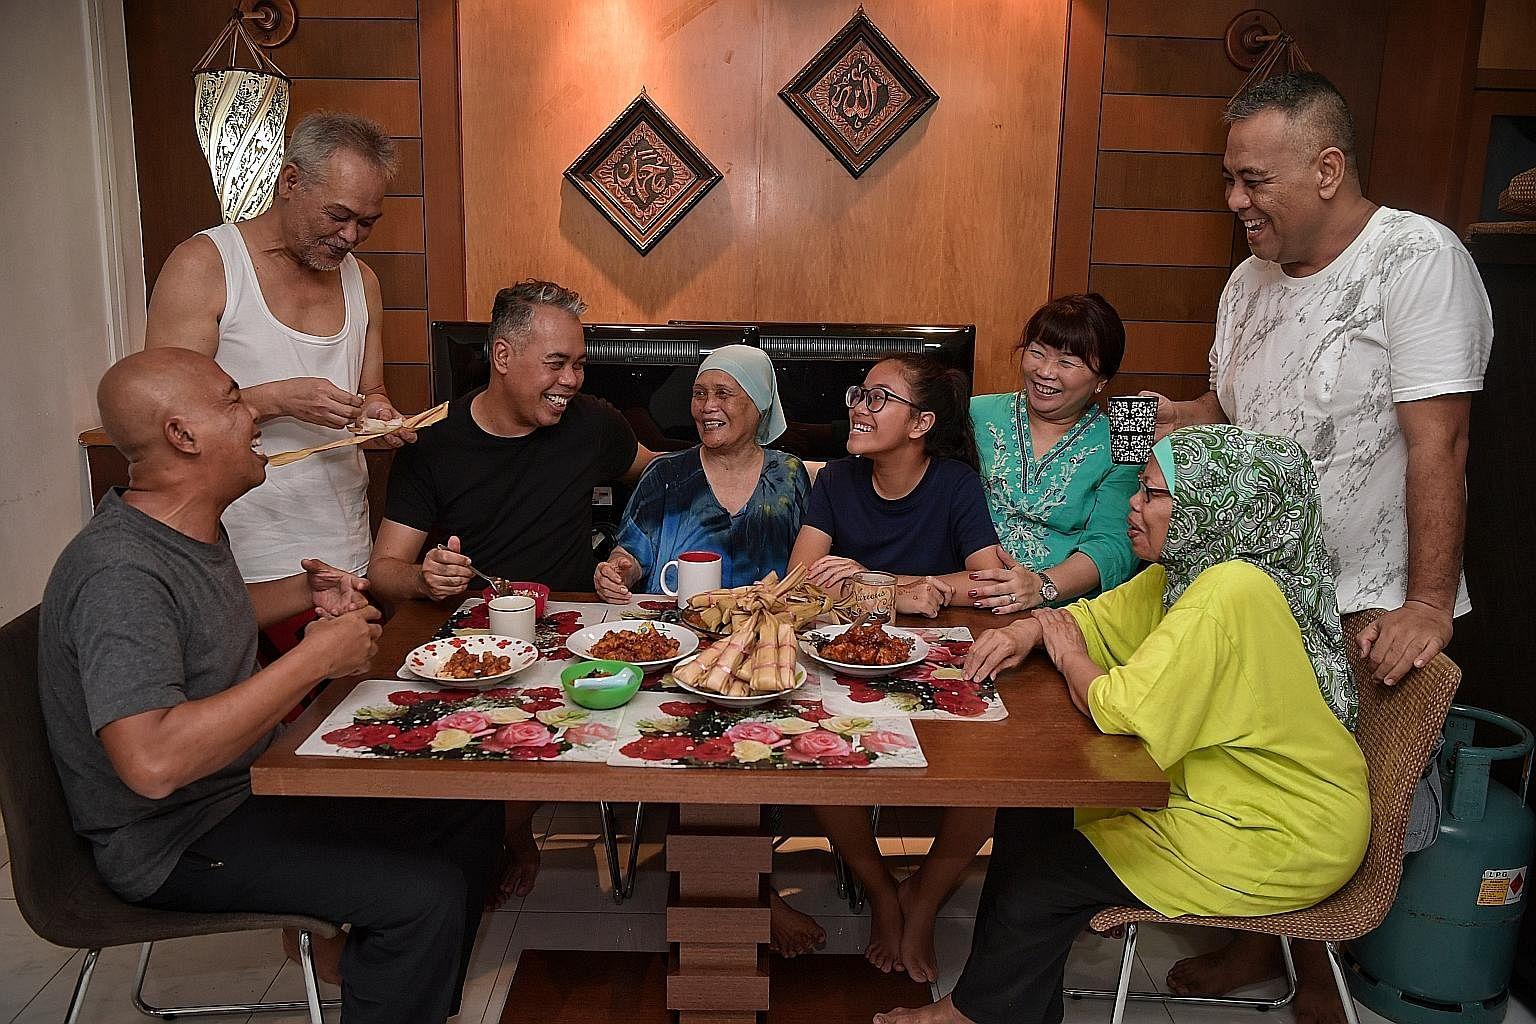 Family members Omar Hashid, 59; Mohd Noor Hashid, 61; Ismail Hashid, 53; Marseah Bonoh, 84; Qurratu'aini Choi Ismail, 14; Nur Qaisarah Alya Choi, 50; Marianah Hashid, 63; and Zulkefli Hashid, 46; taking a break from the cooking yesterday.